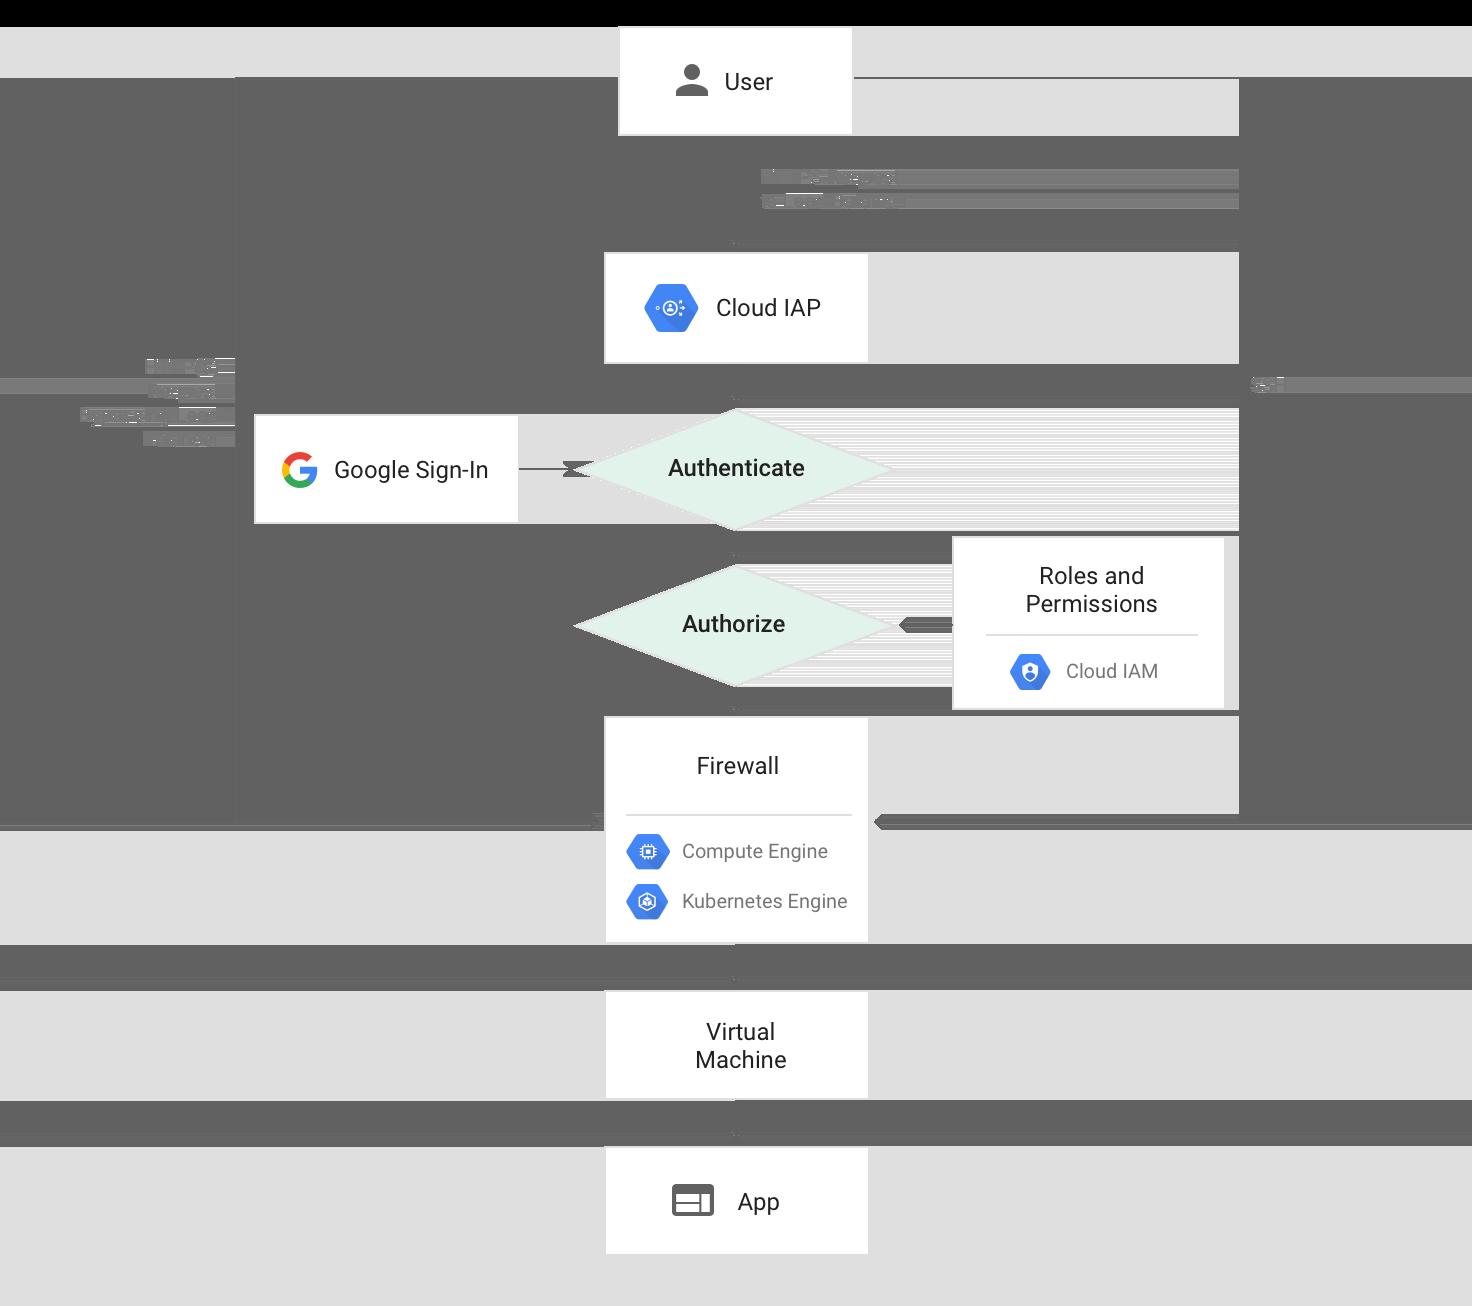 Cloud IAP 使用時の Compute Engine と Kubernetes Engine へのリクエストパスの図